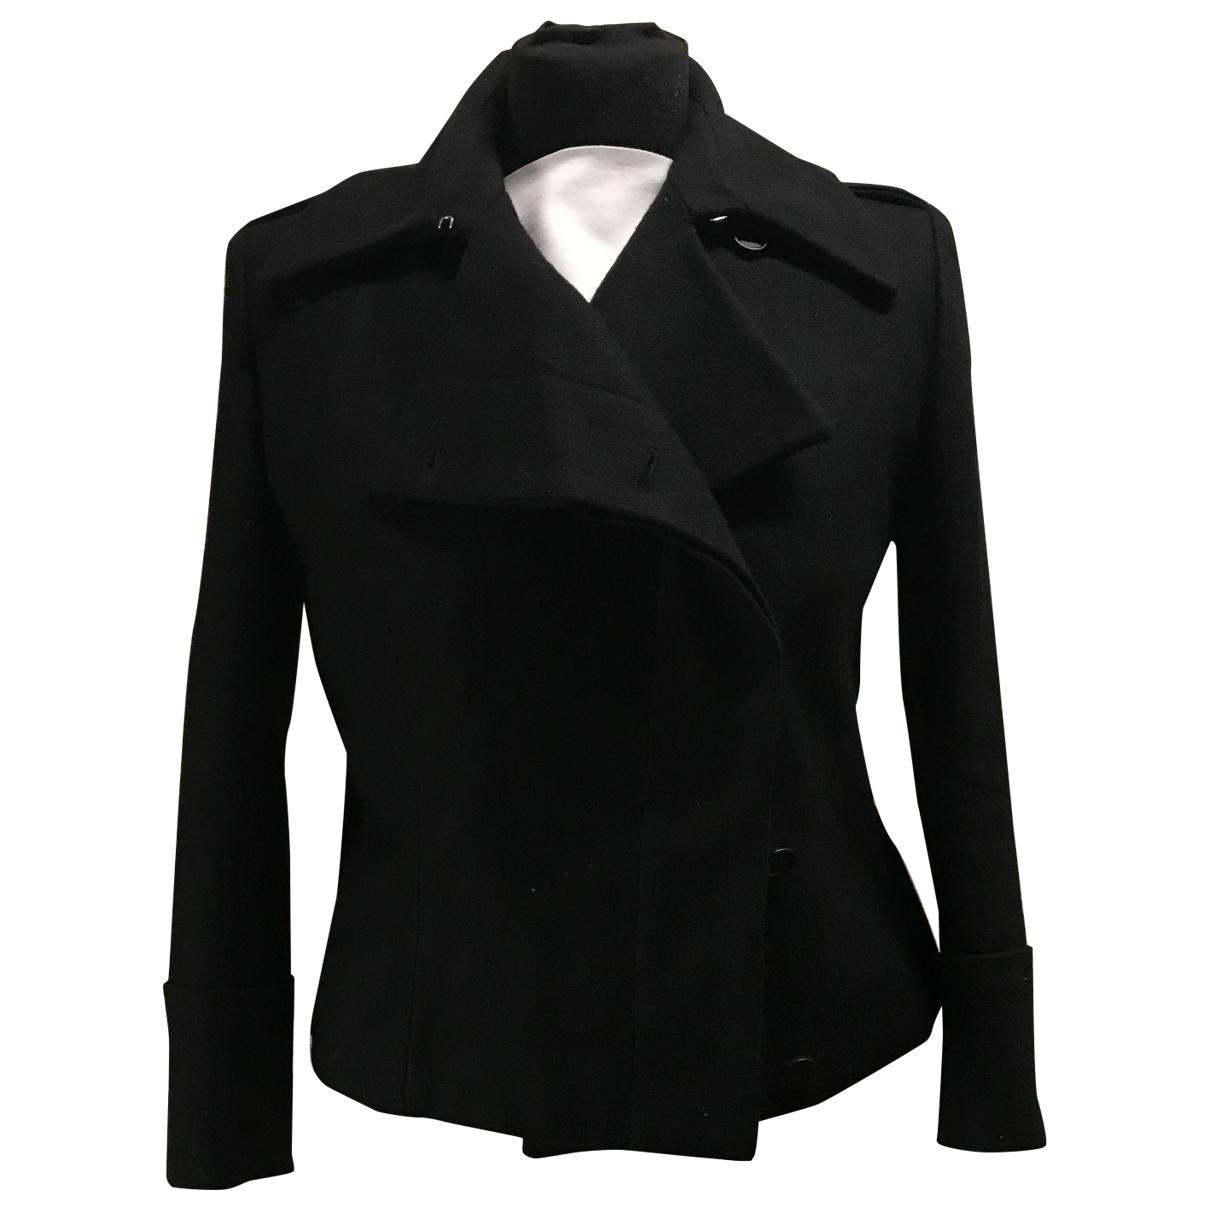 Alexander Mcqueen \N Black Wool coat for Women S International